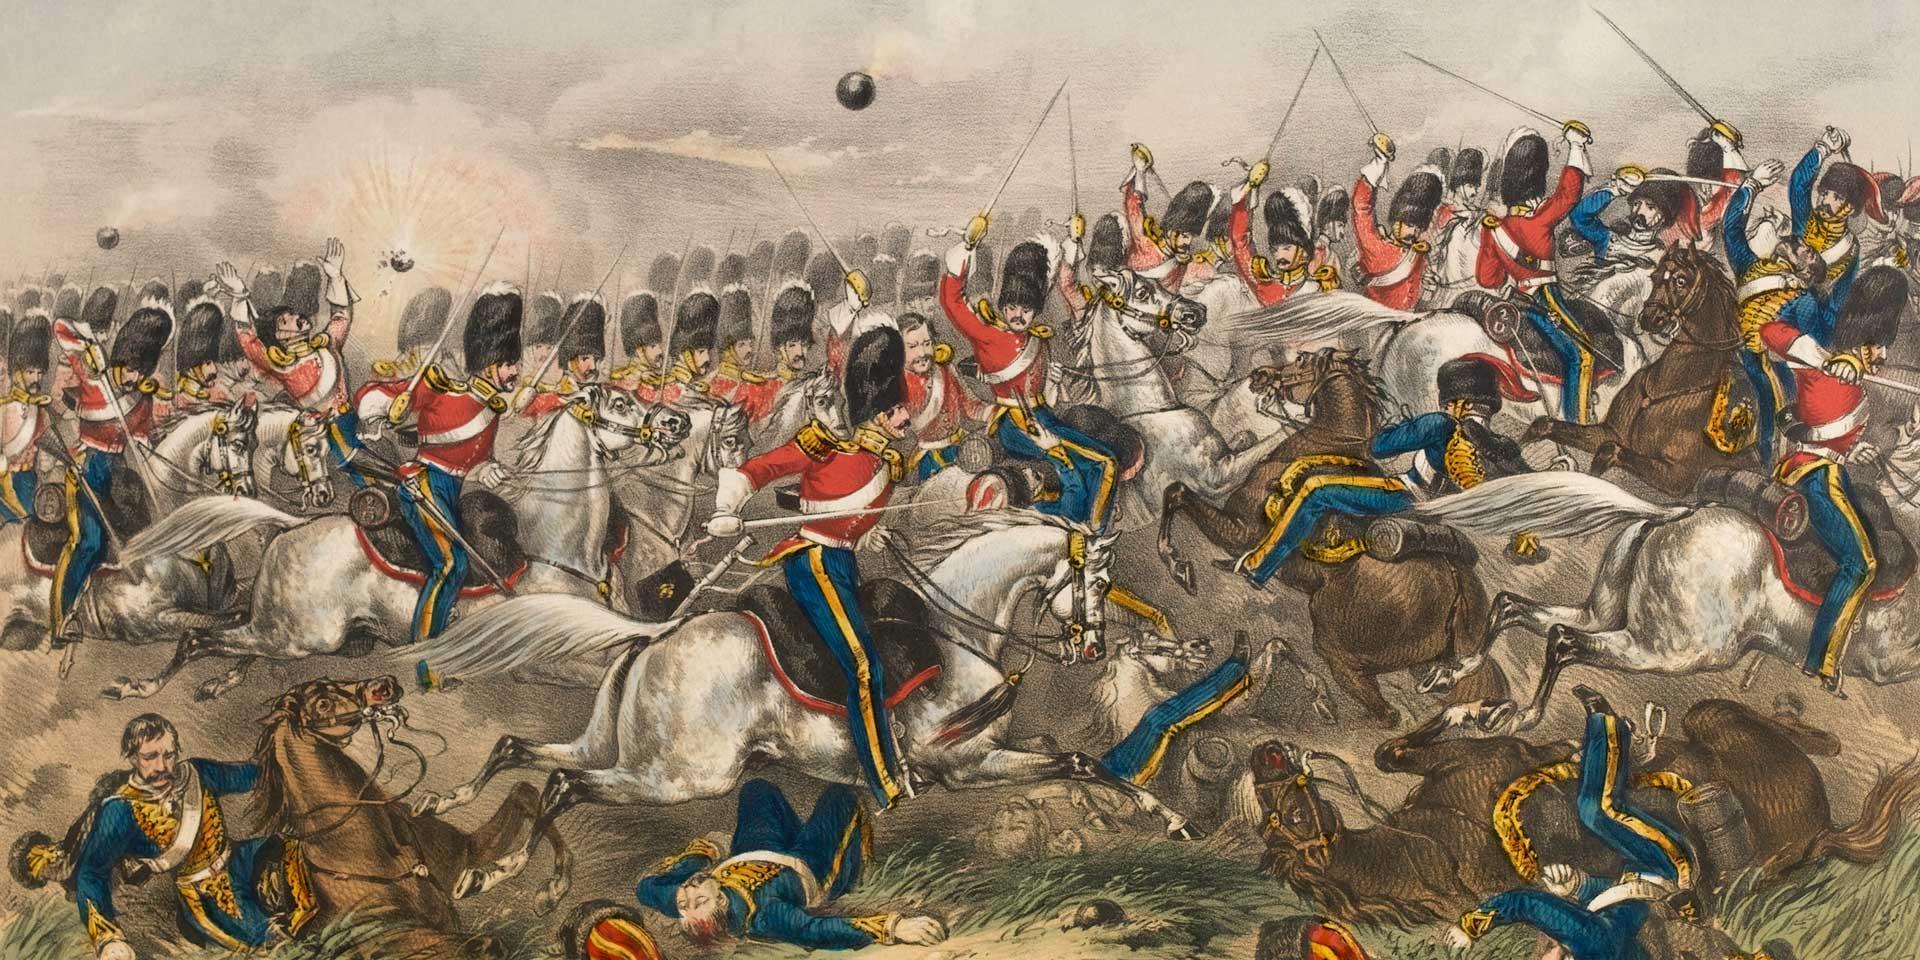 The Royal Scots Greys charging with the Heavy brigade at Balaklava, 1854